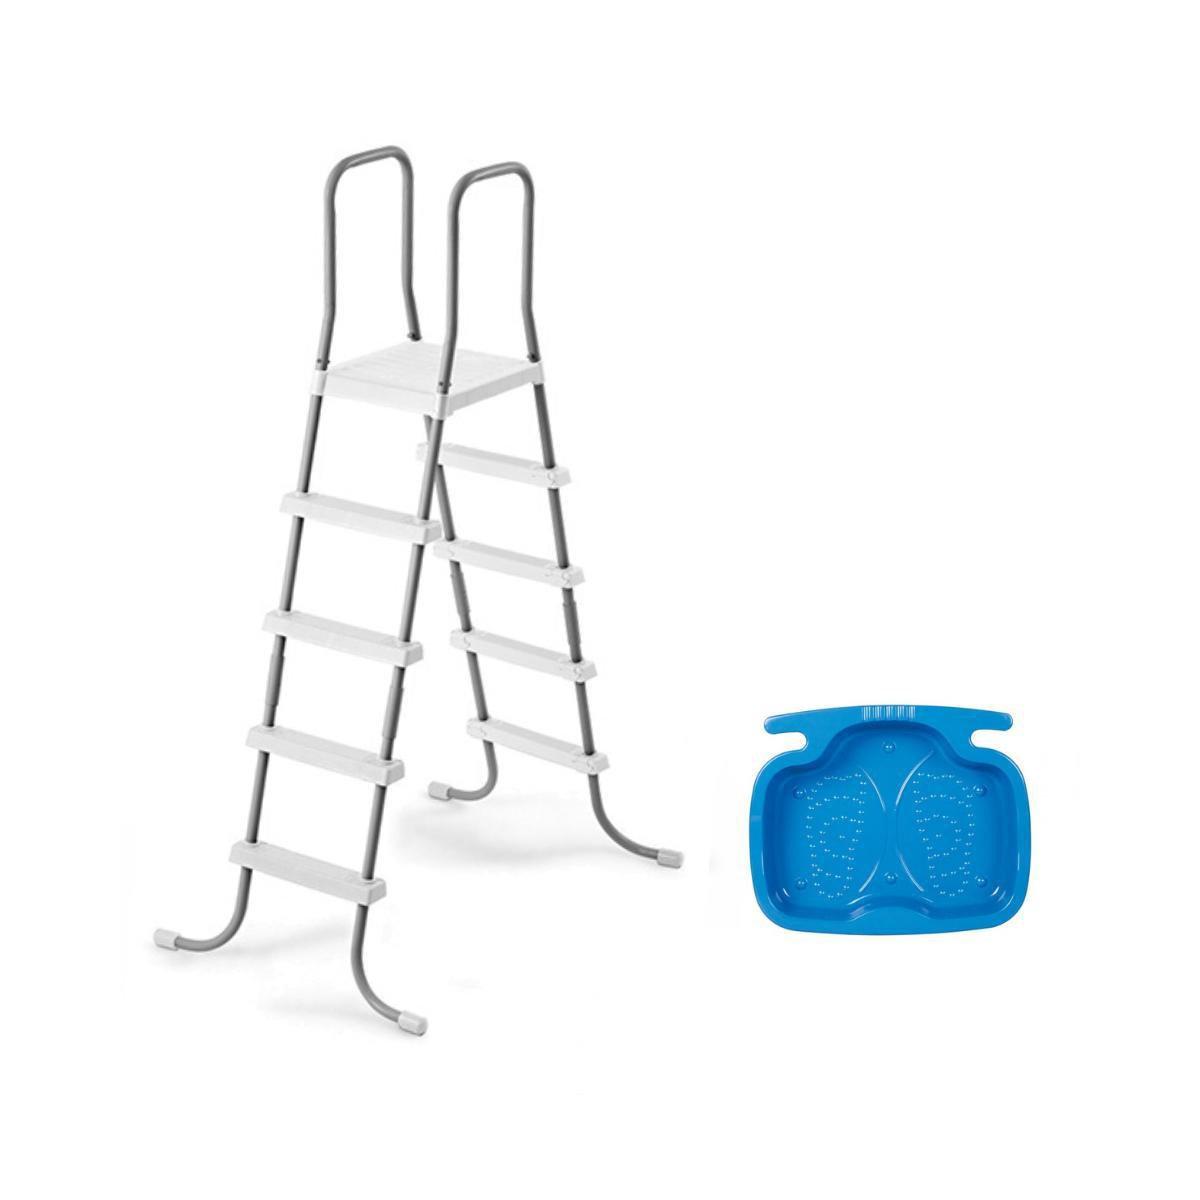 Intex trap groot (132 cm) + voetenbad